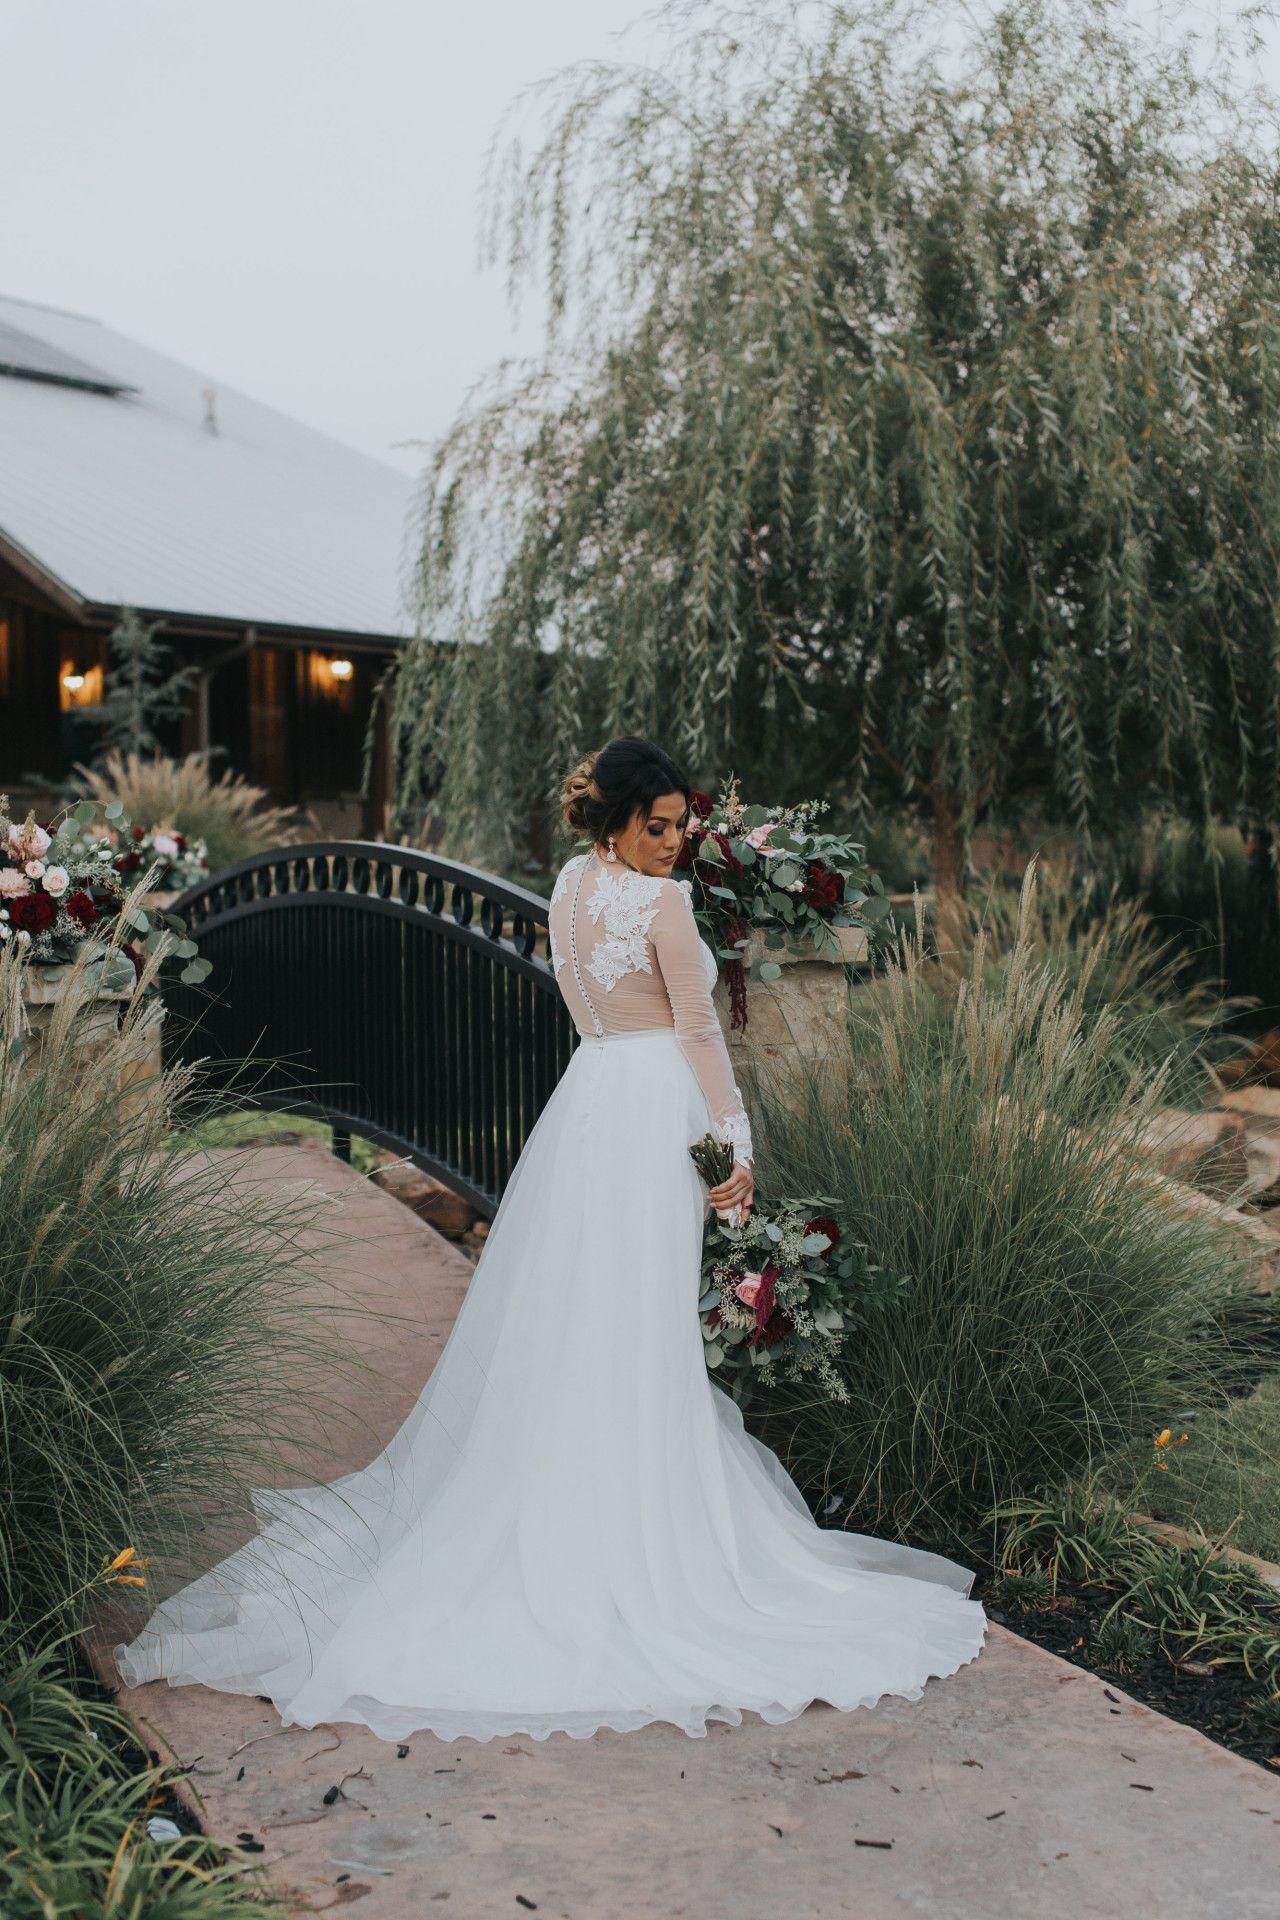 Outdoor Bridal Portrait Ideas Brides Of Oklahoma Okc Outdoor Wedding Venue Outdo Bridal Portrait Poses Bridal Portraits Outdoor Oklahoma Wedding Venues